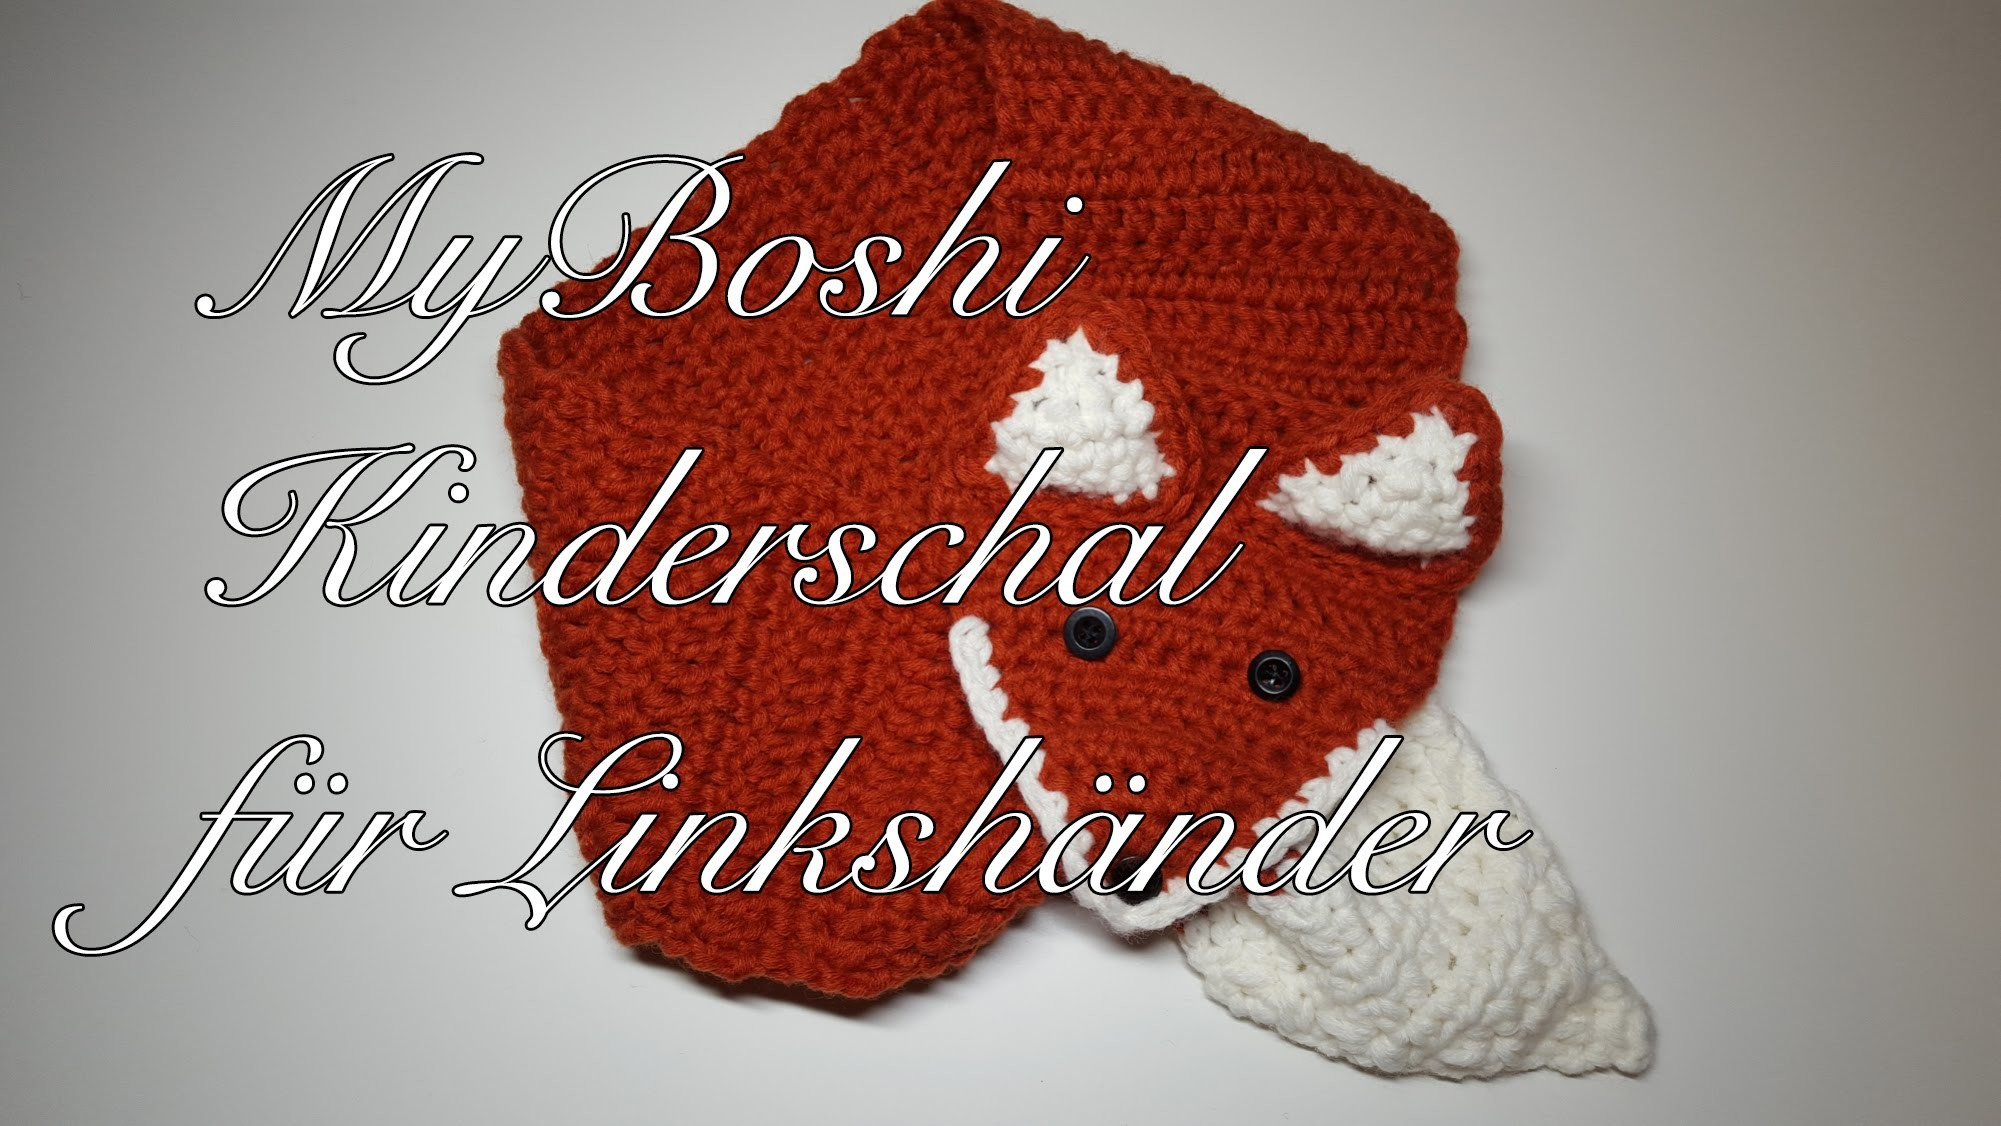 MyBoshi Kinderschal häkeln Anleitung MyBoshi Kitsune Schal häkeln für Linkshänder